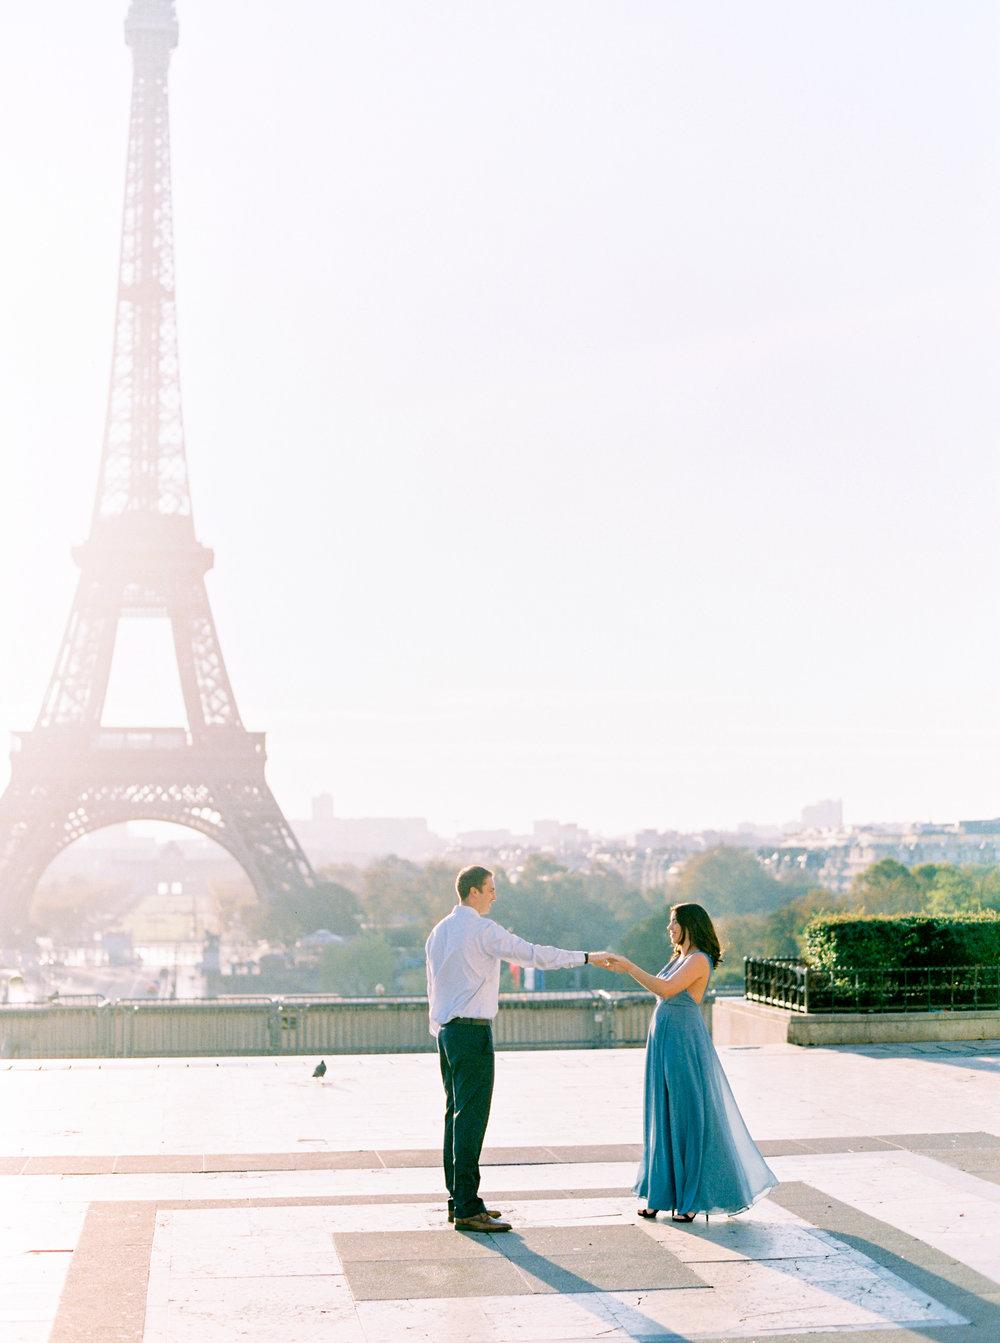 paris-france-wedding-photographer-destination-photographer-79.jpg